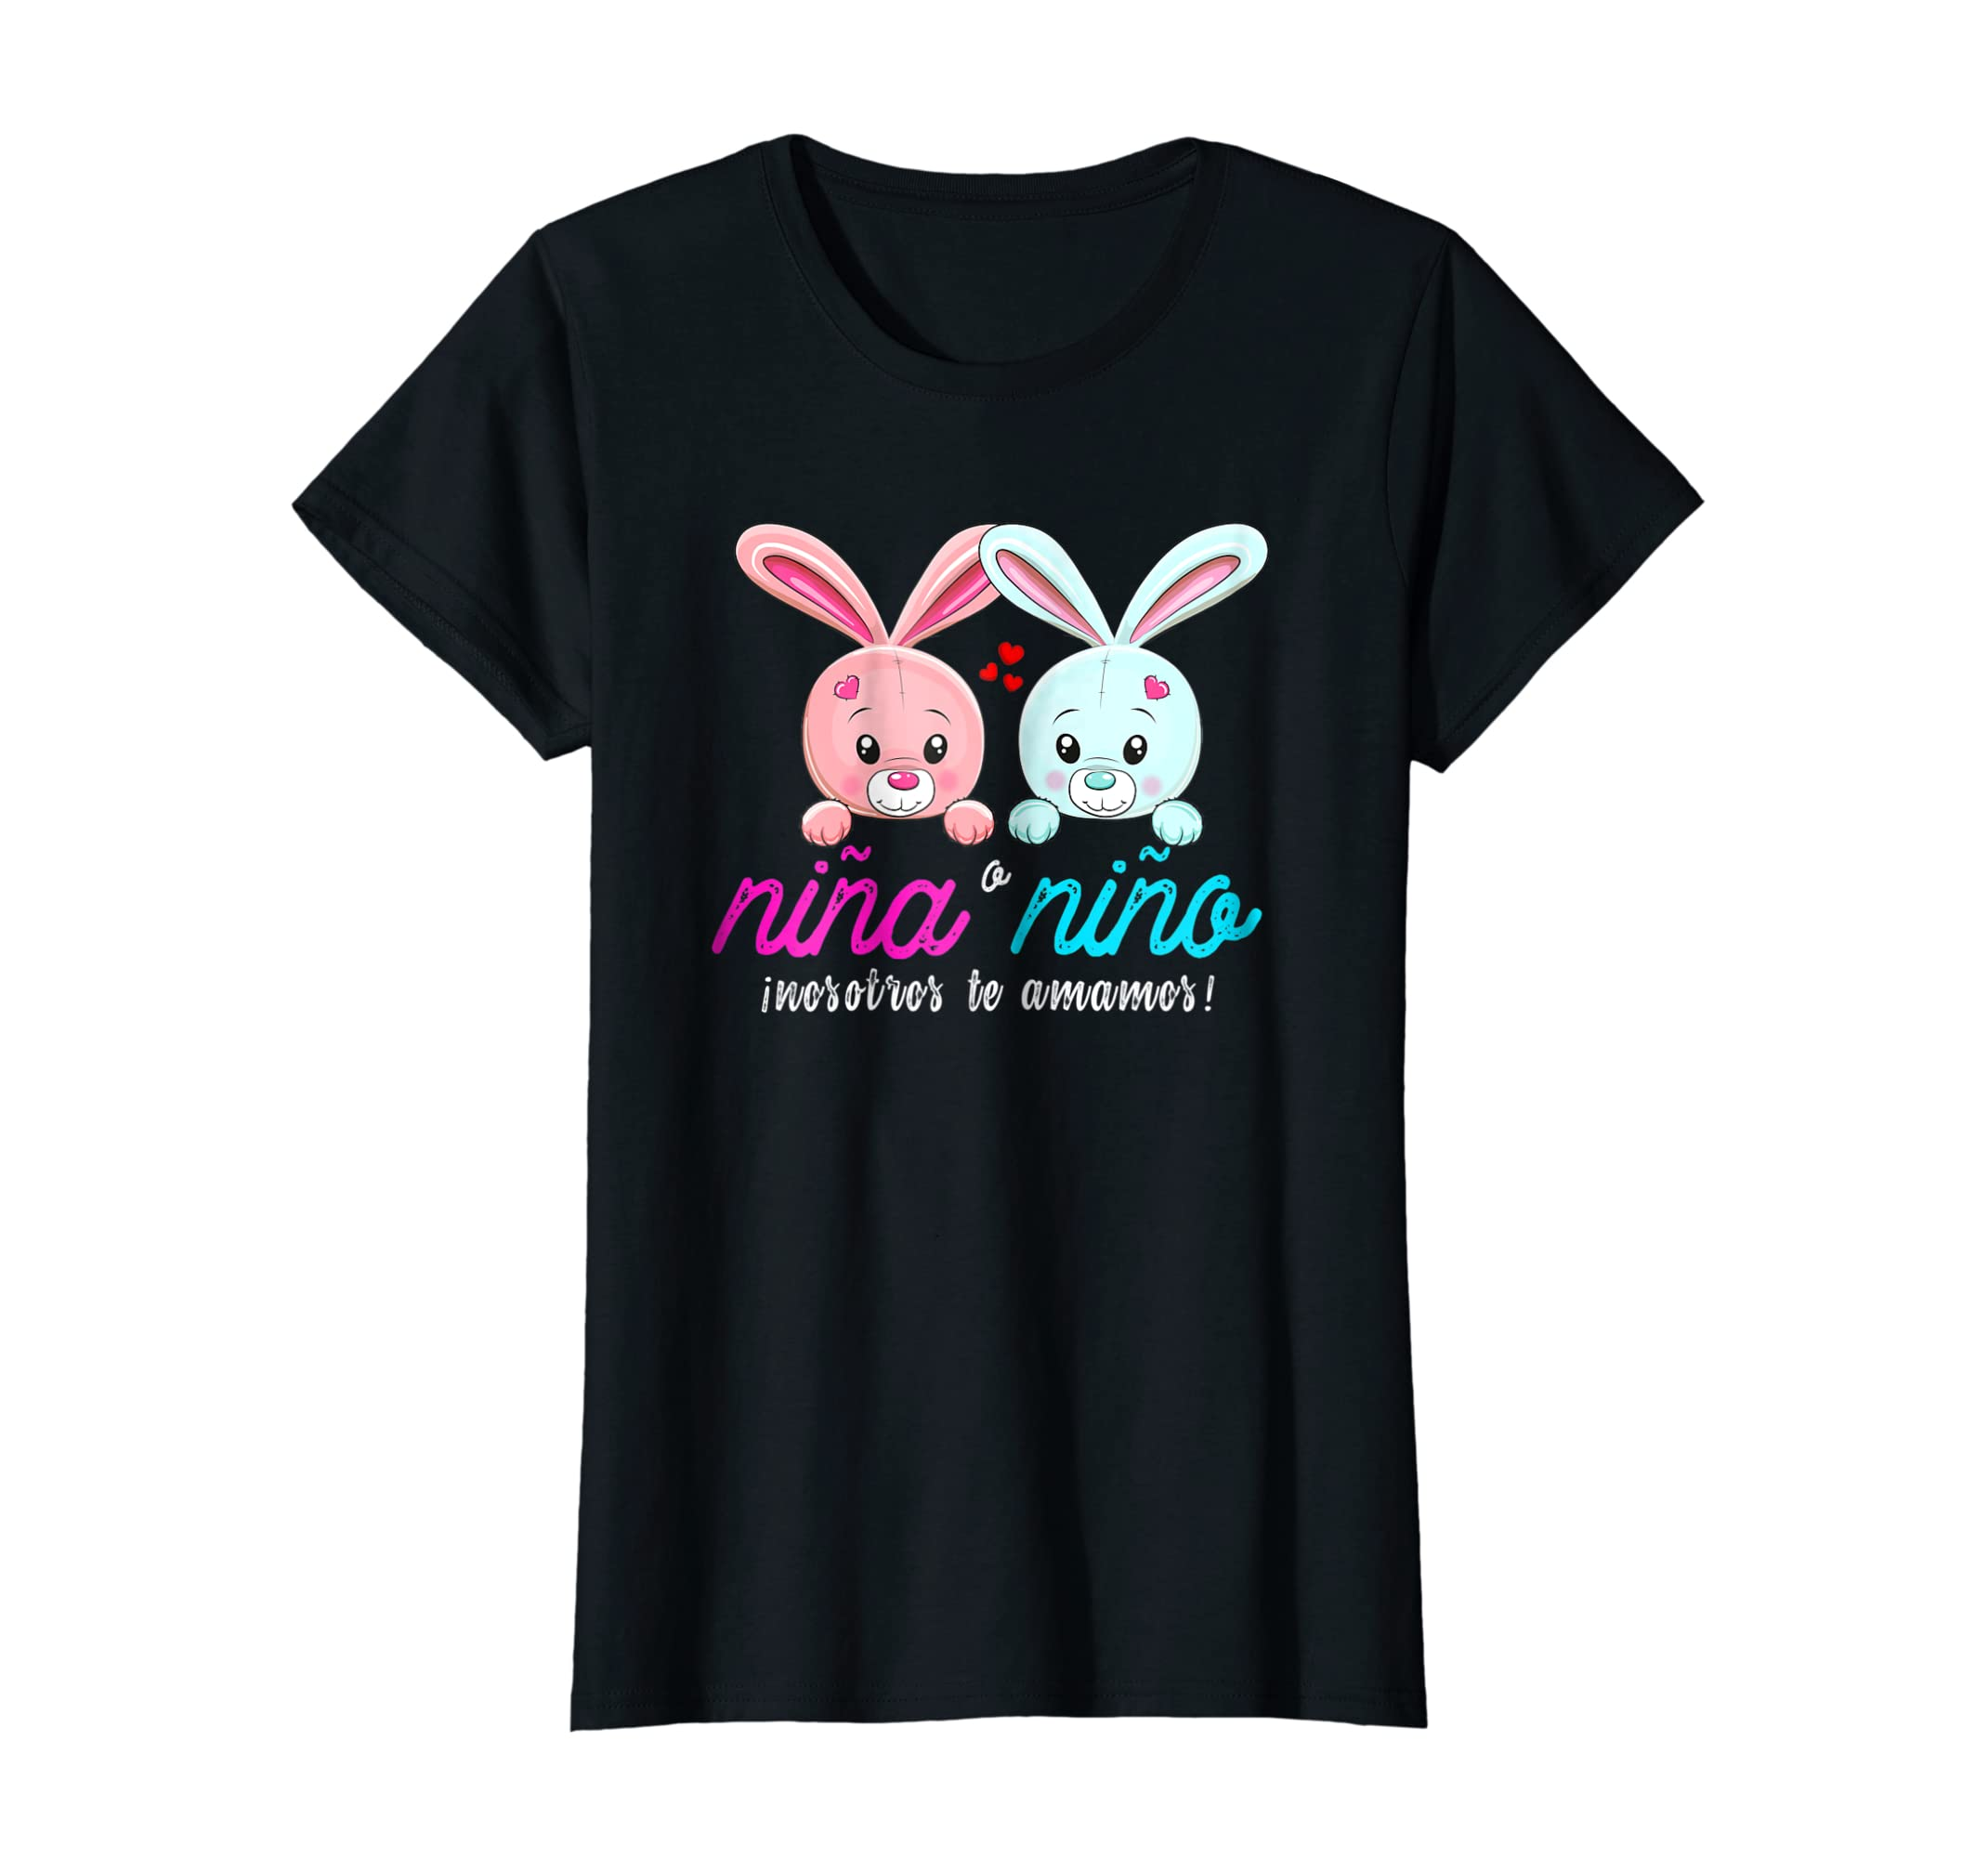 Amazon.com: Playera latina nina o nino para fiesta revelacion de genero: Clothing